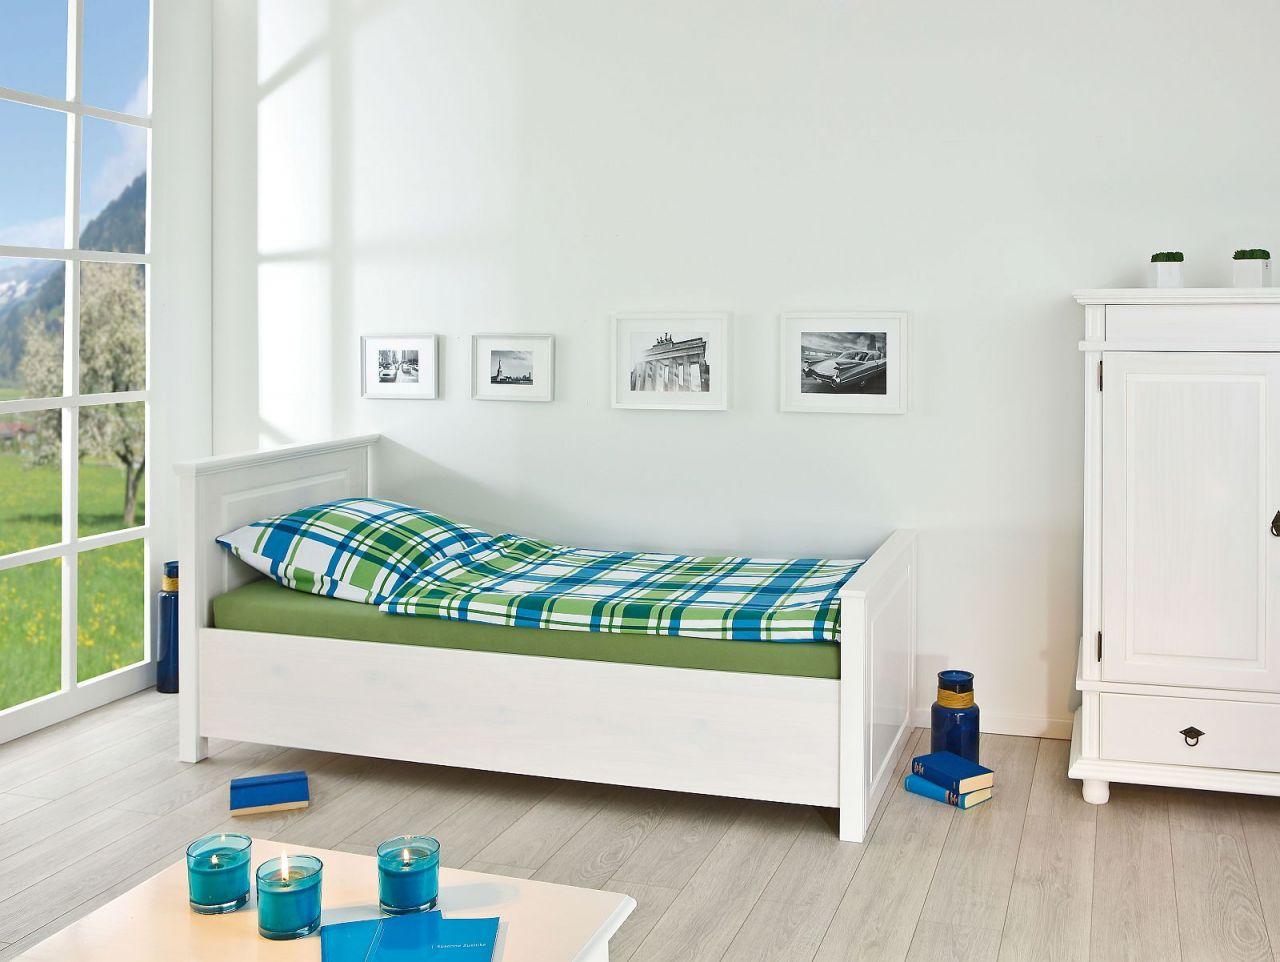 bett doppelbett einzelbett 4 gr en landhausstil massivholz wei holzmaserung l dank 5 kaufen. Black Bedroom Furniture Sets. Home Design Ideas